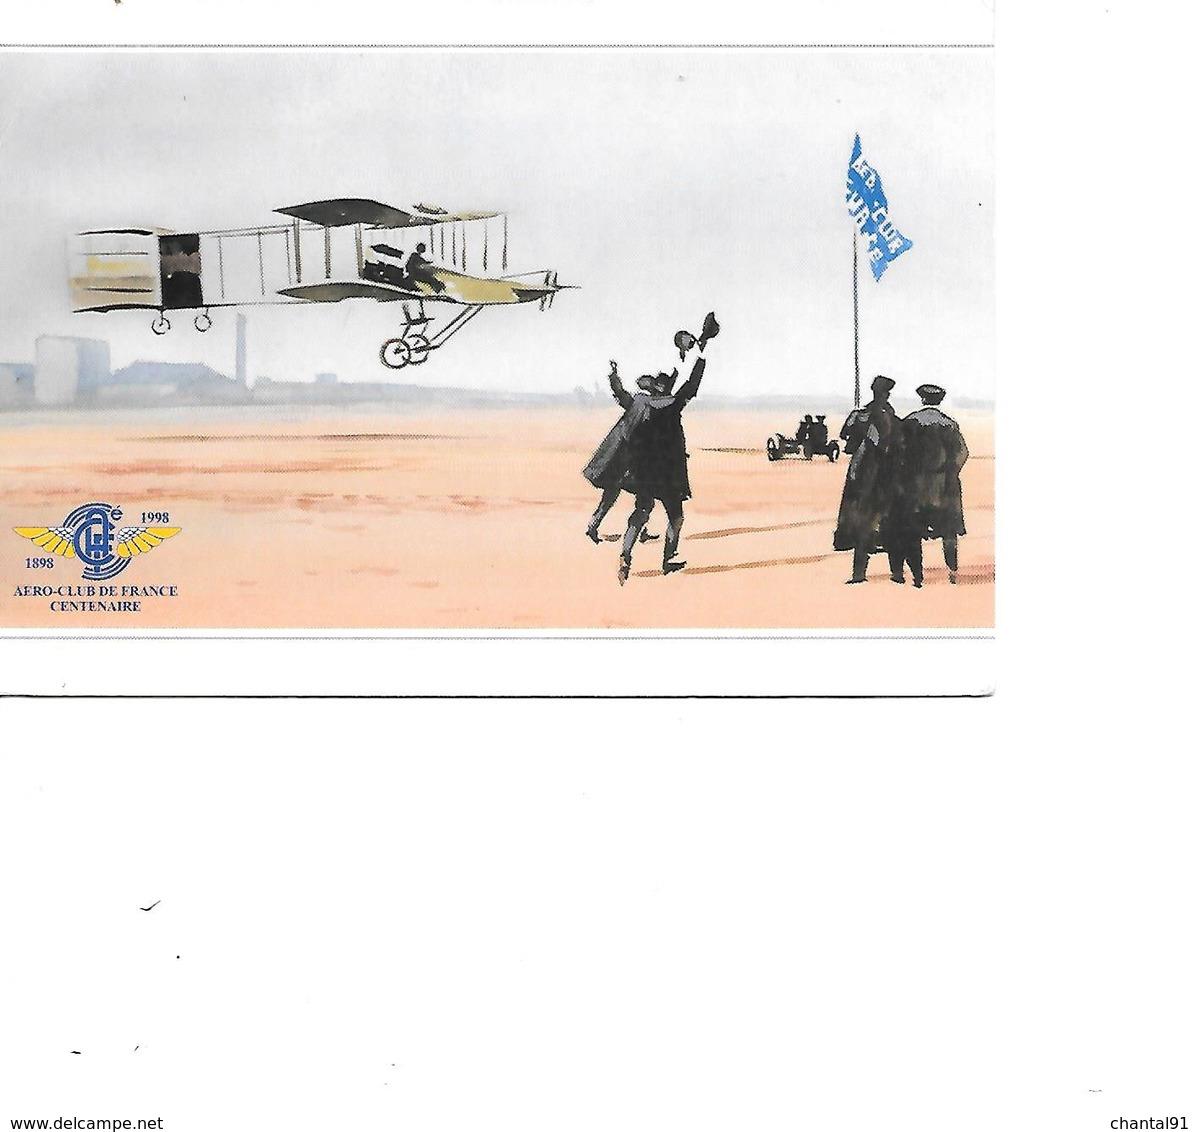 CARTE POSTALE PREMIER KILOMETRE EN CIRCUIT FERME - Avions